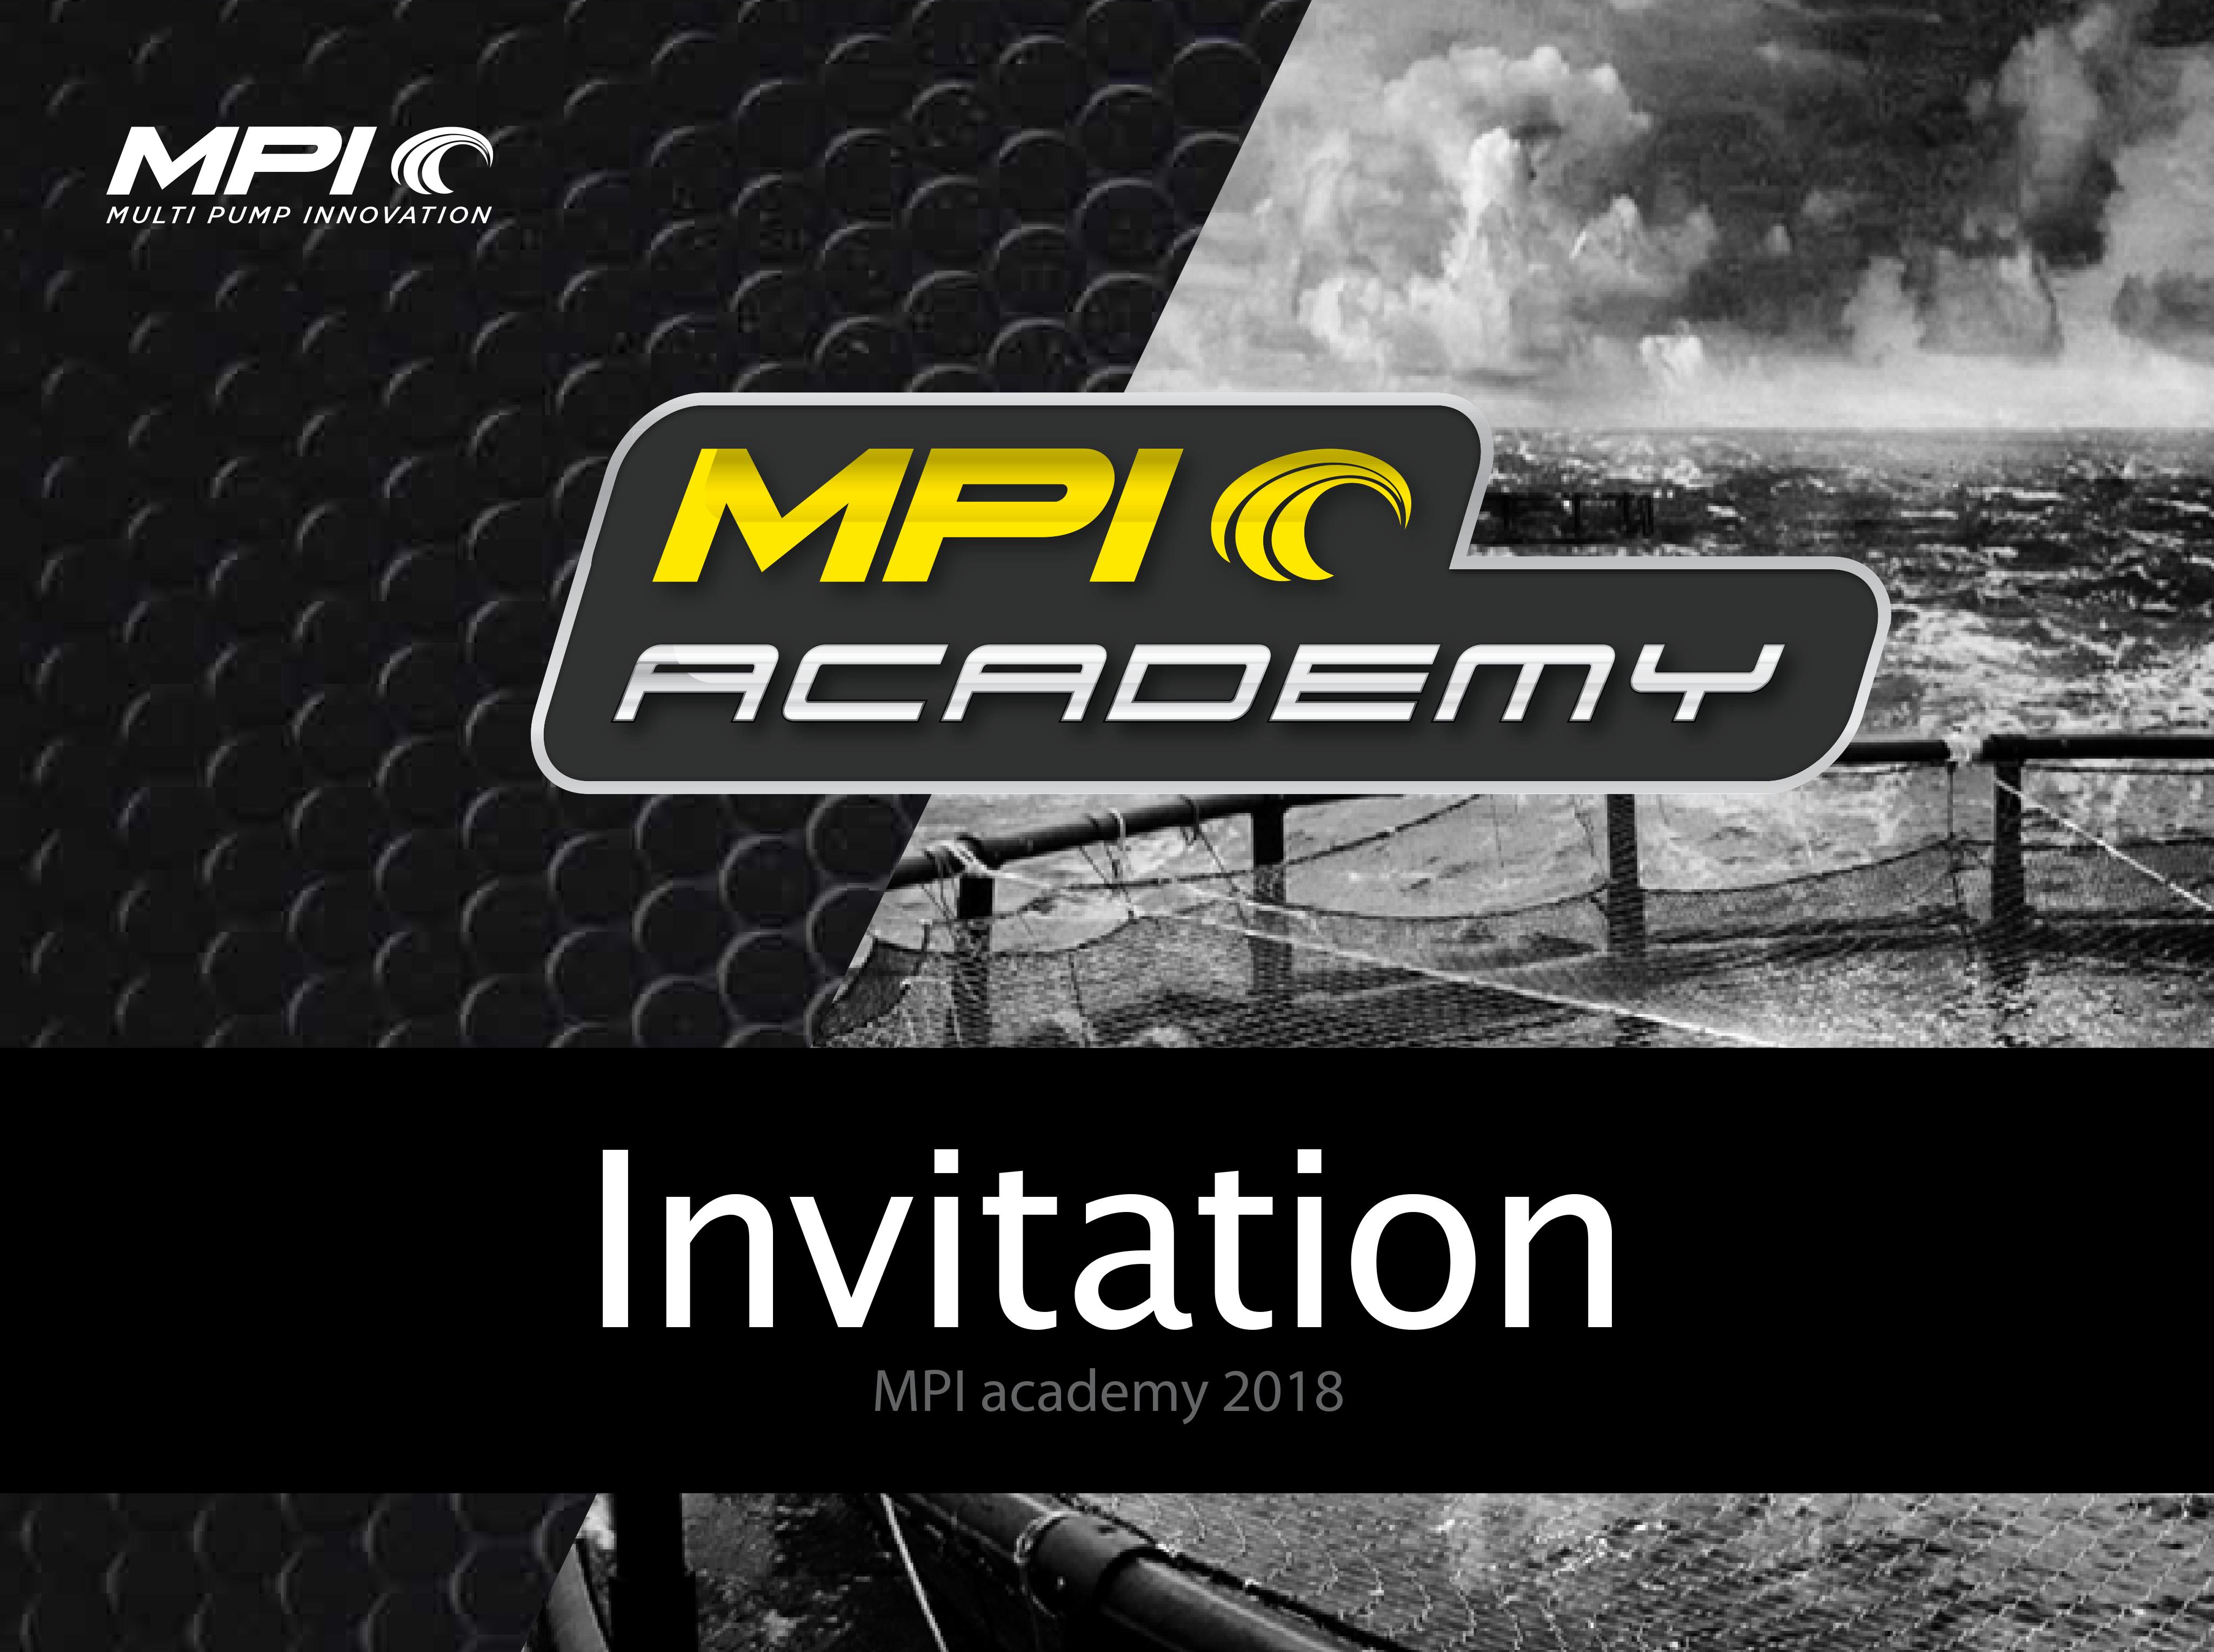 Mpi academy mach2018